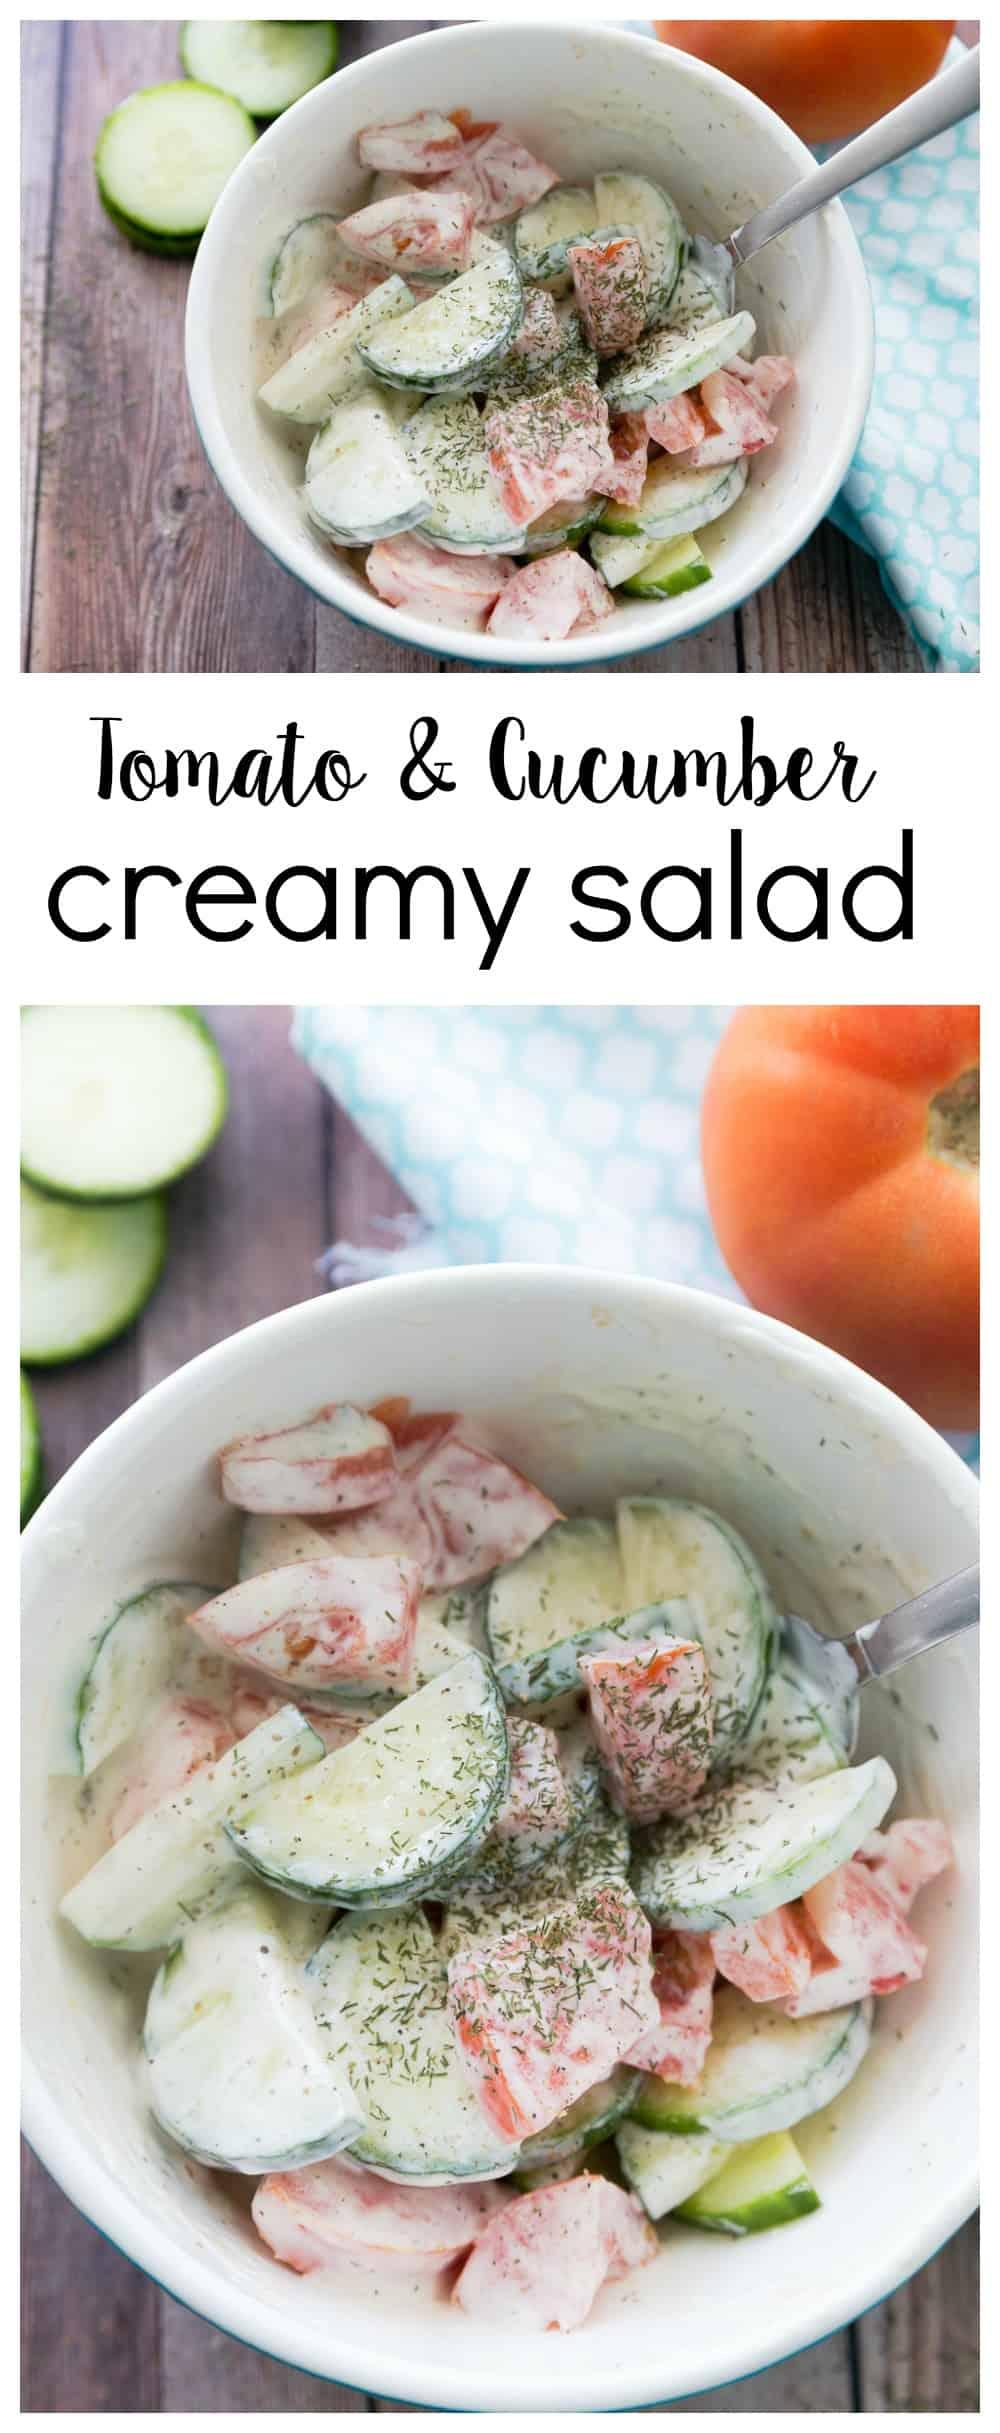 tomato-cucumber-creamy-salad